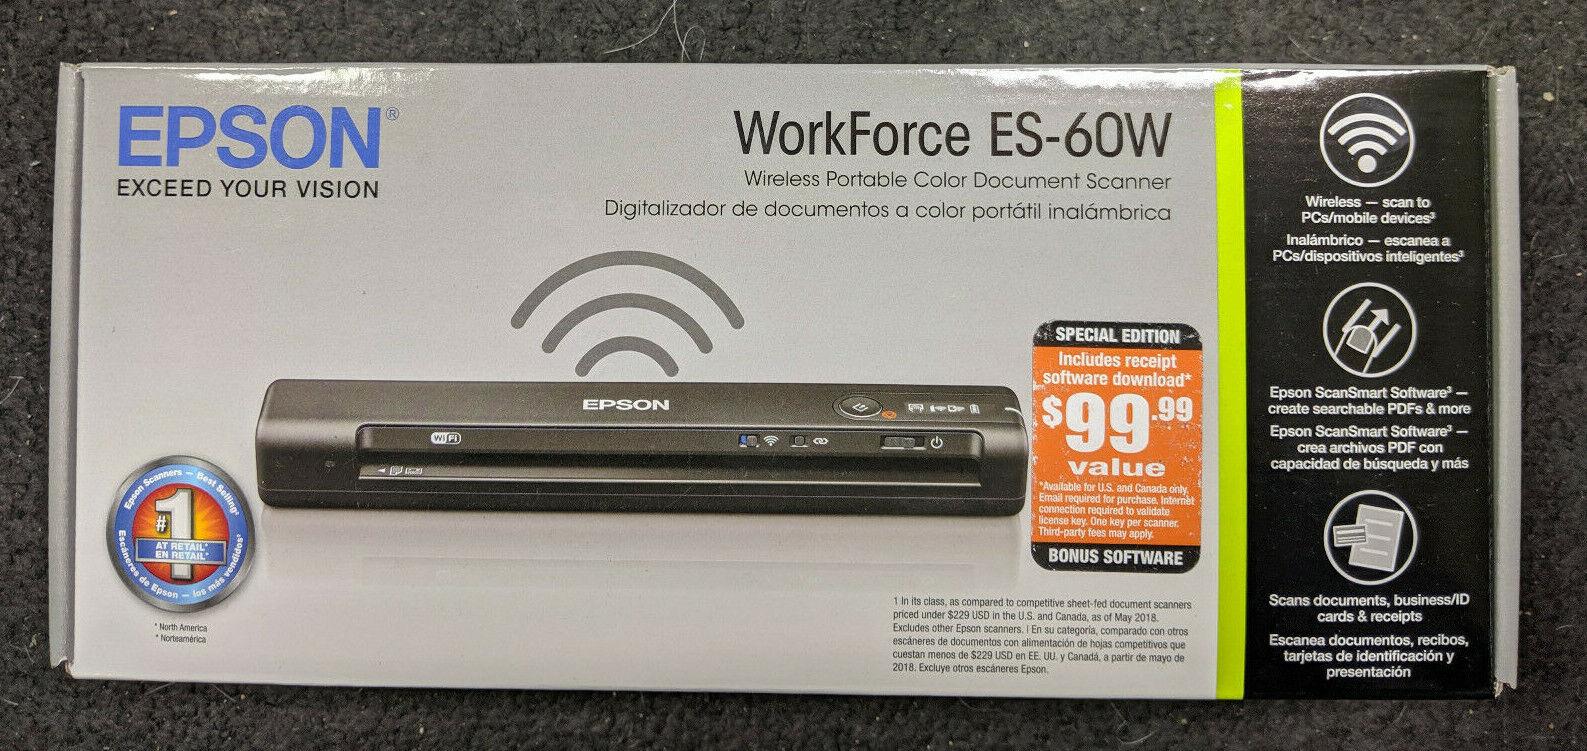 Epson WorkForce ES-60W Wireless Portable Color Document Scan